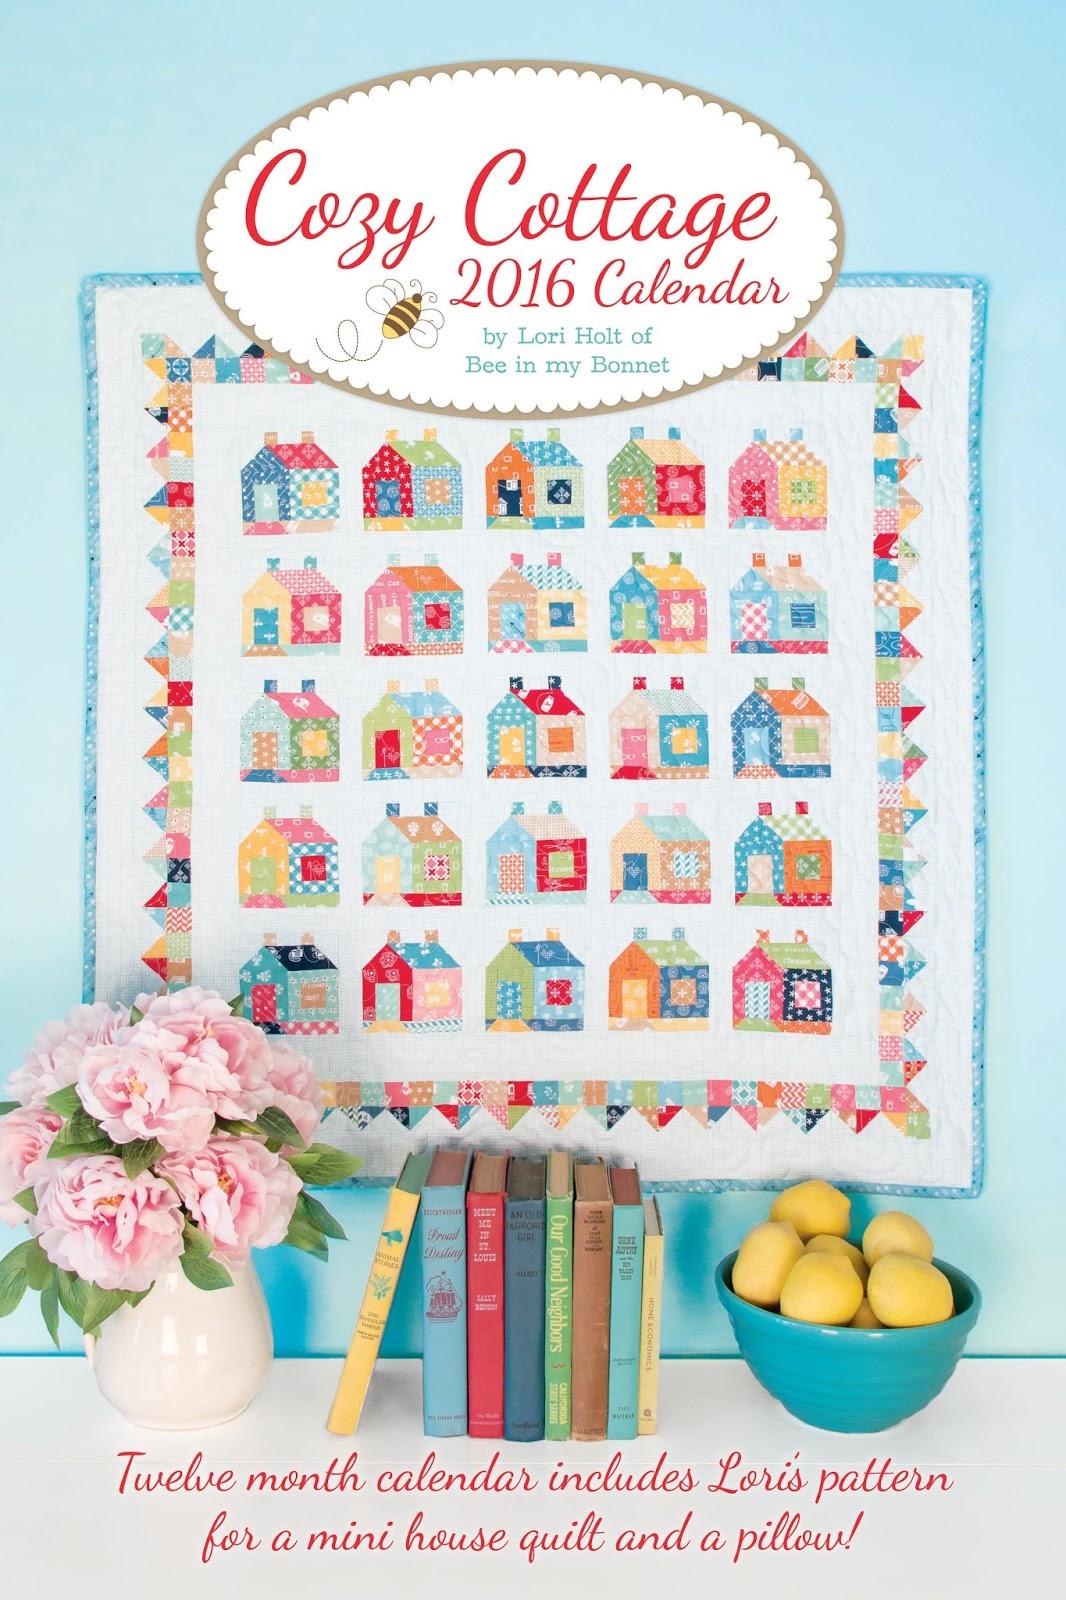 2016 Calendar - Cozy Cottage by Lori Holt